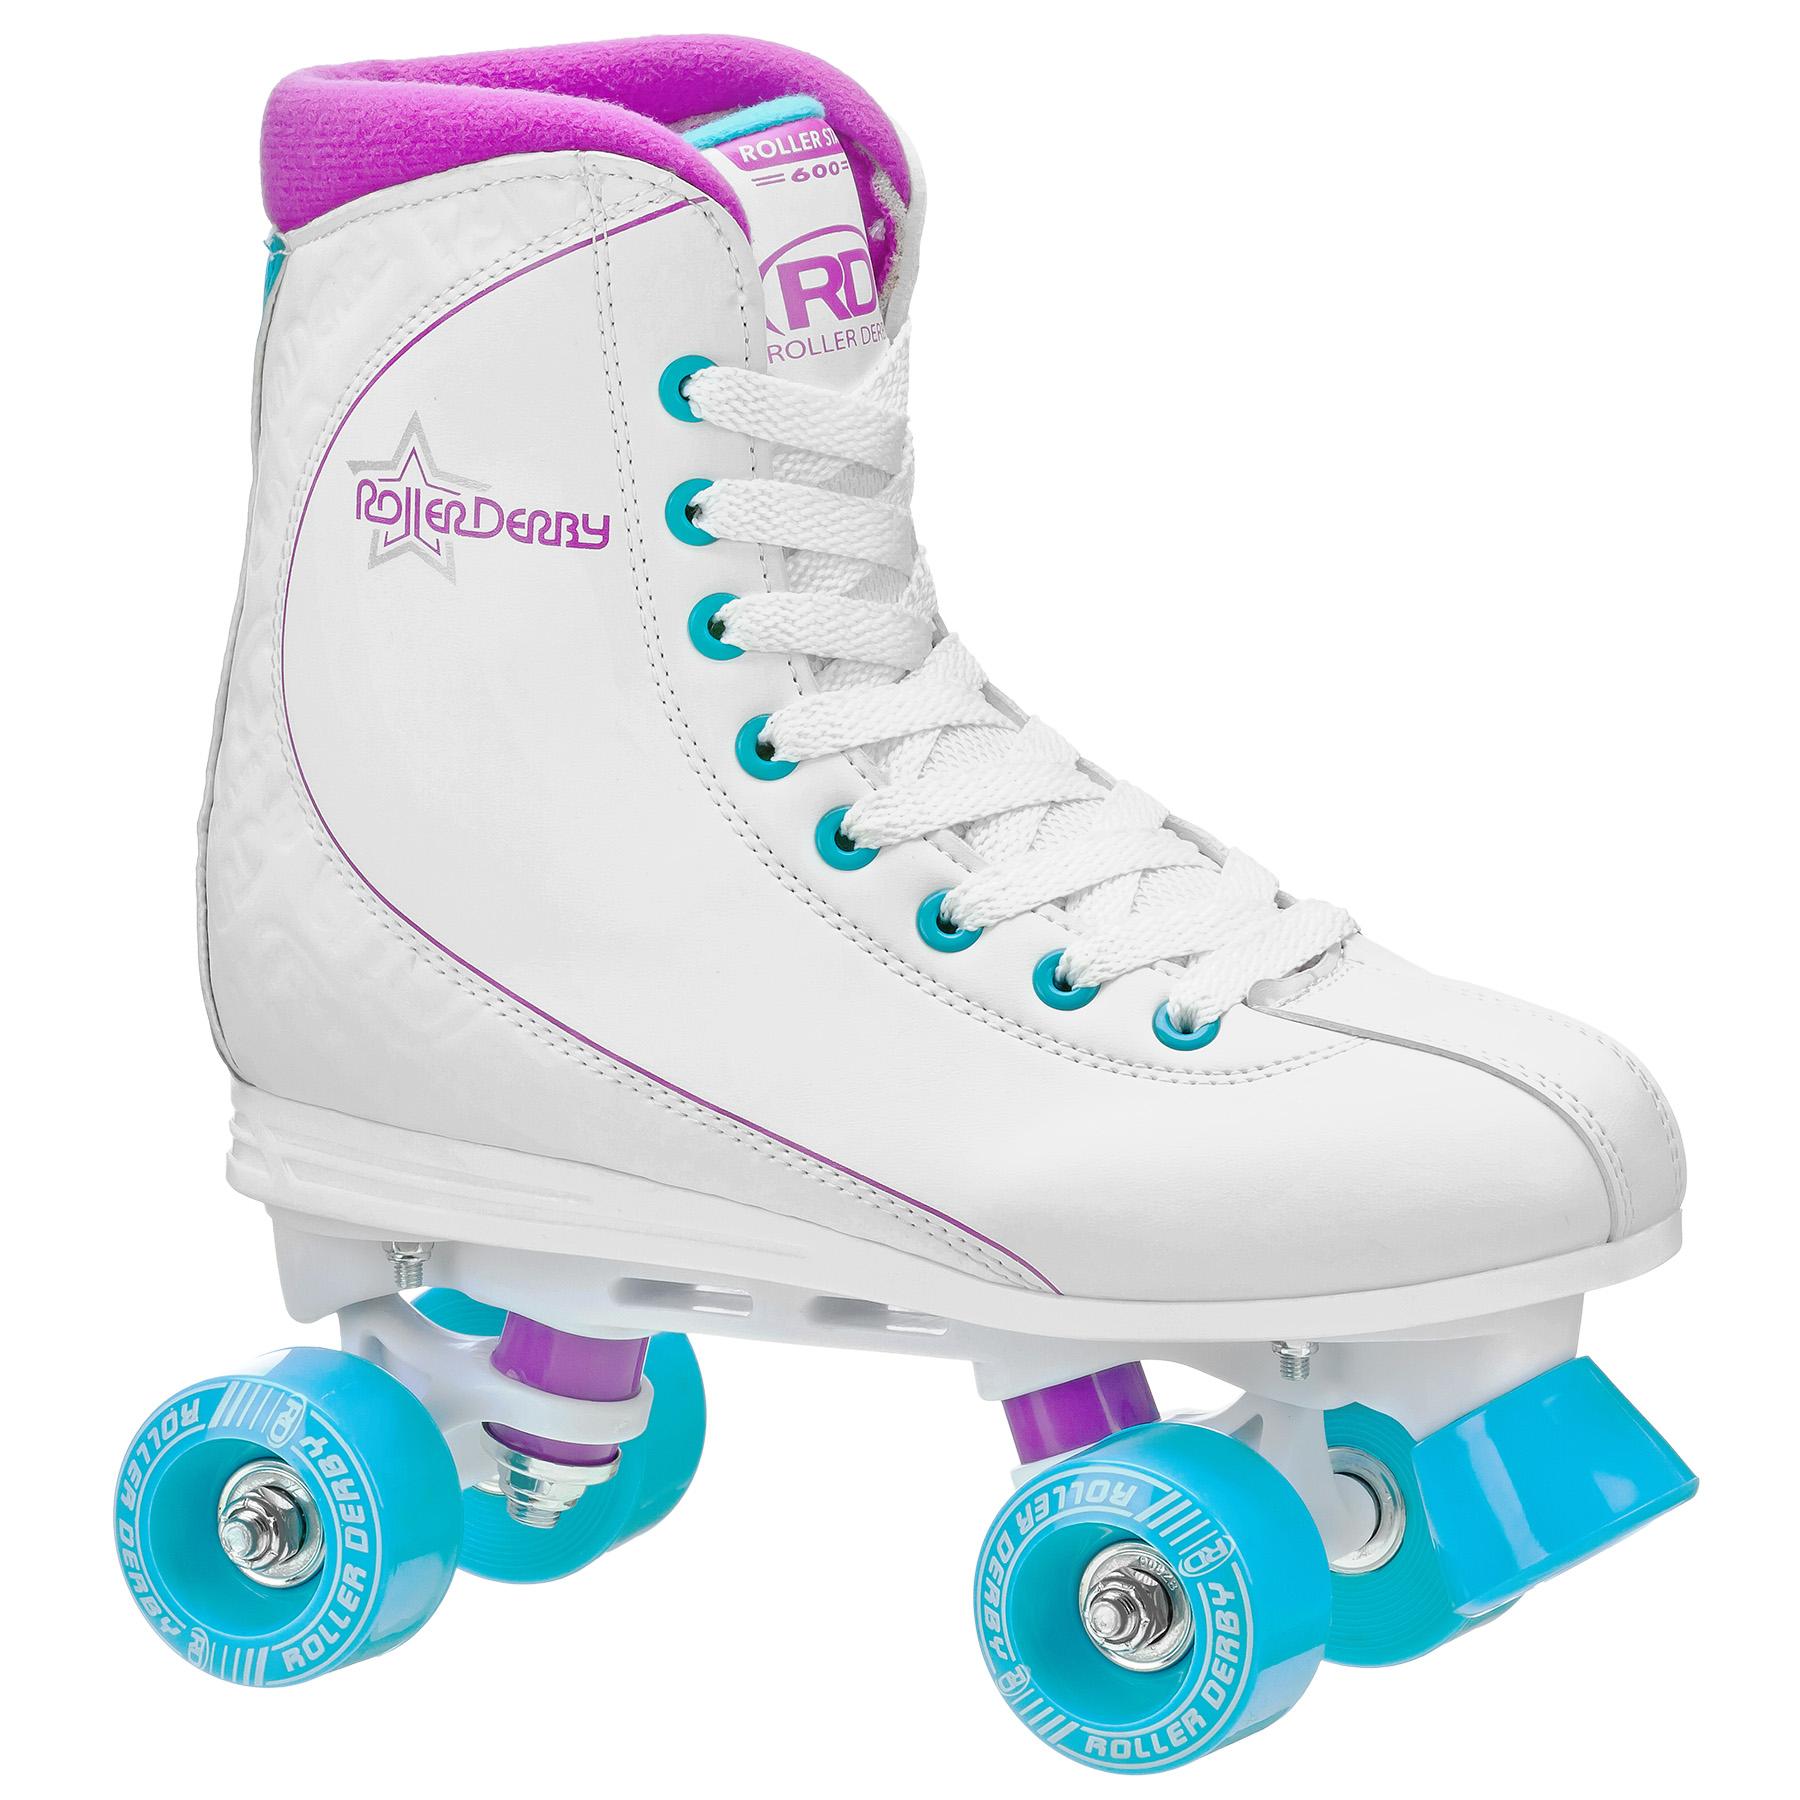 Roller derby roller star 600 women s quad skate